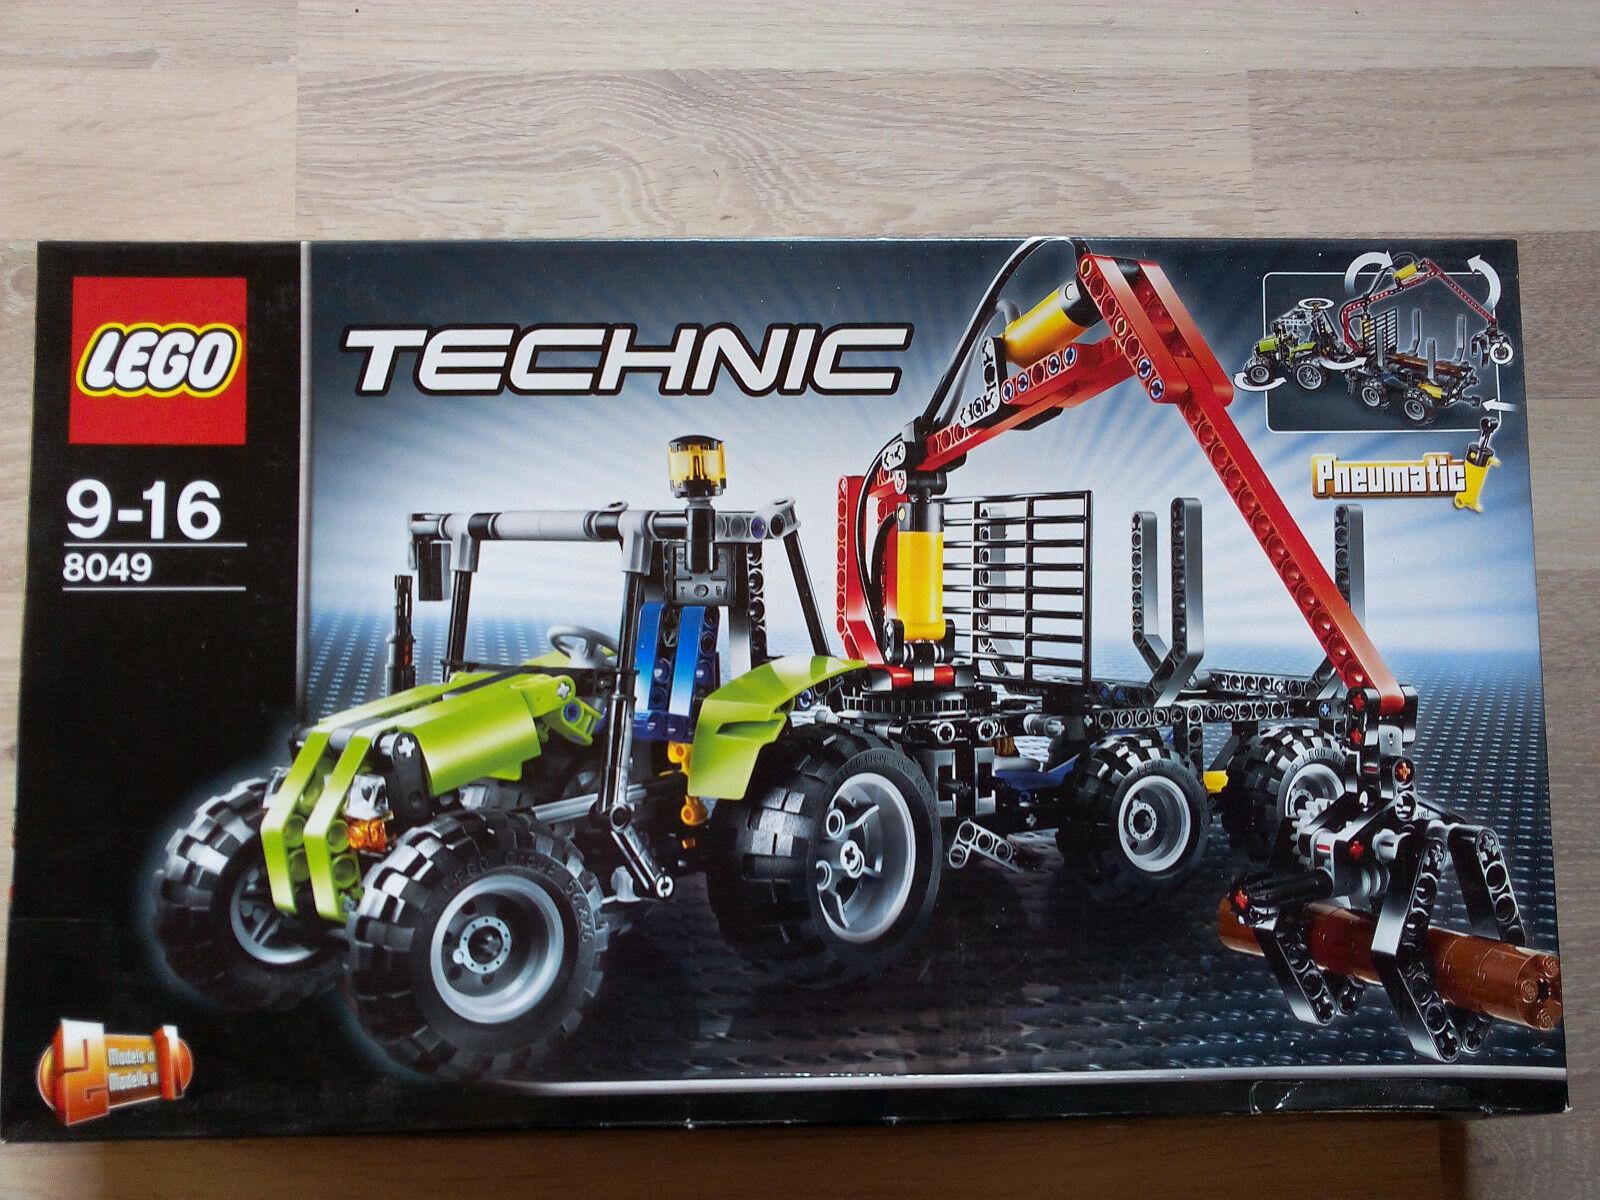 Lego Technic Technik 8049 Tractor with Log Loader   NEU & OVP - UNGEÖFFNET